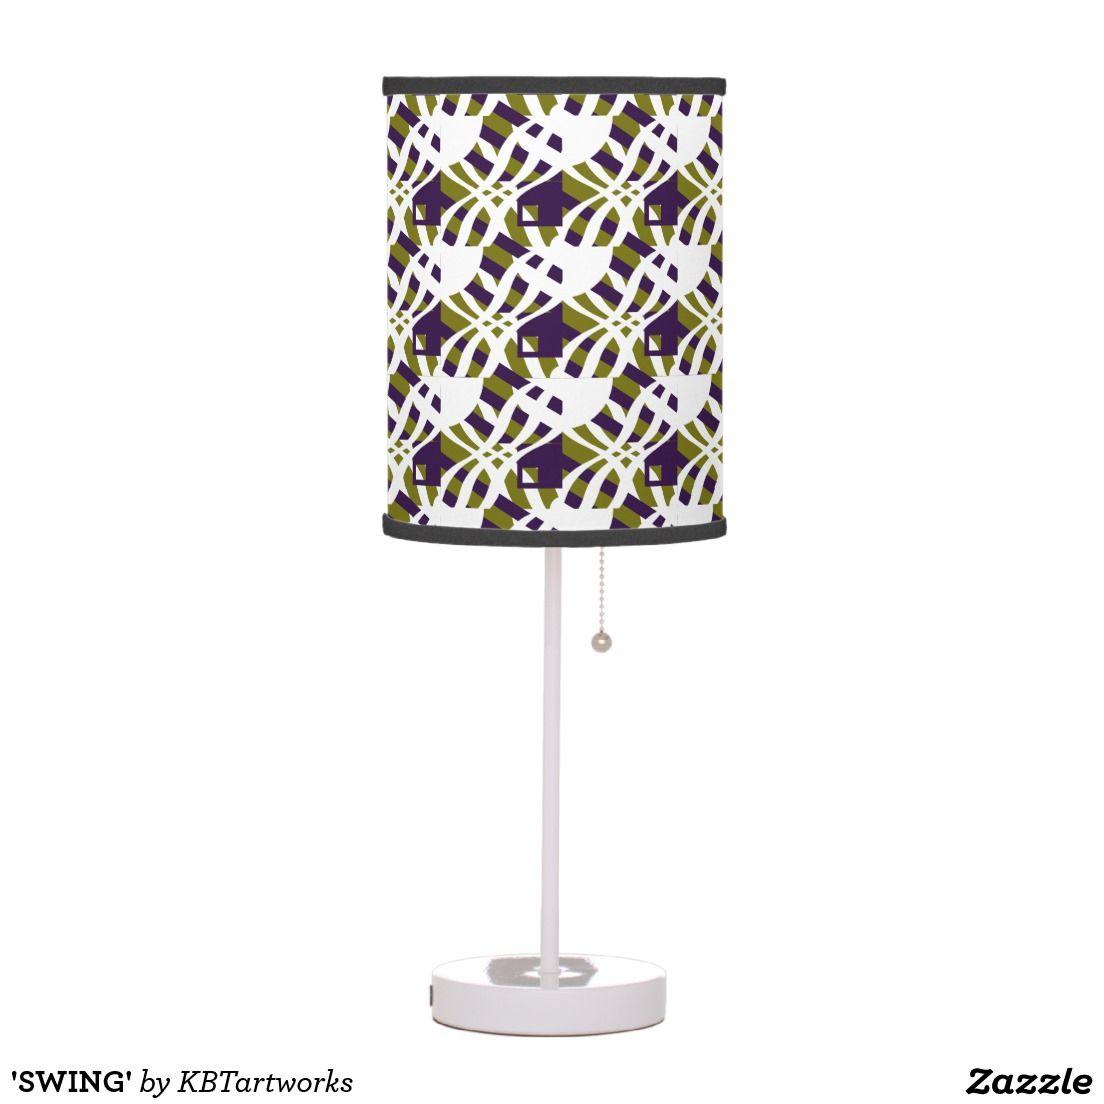 'SWING' TABLE LAMP